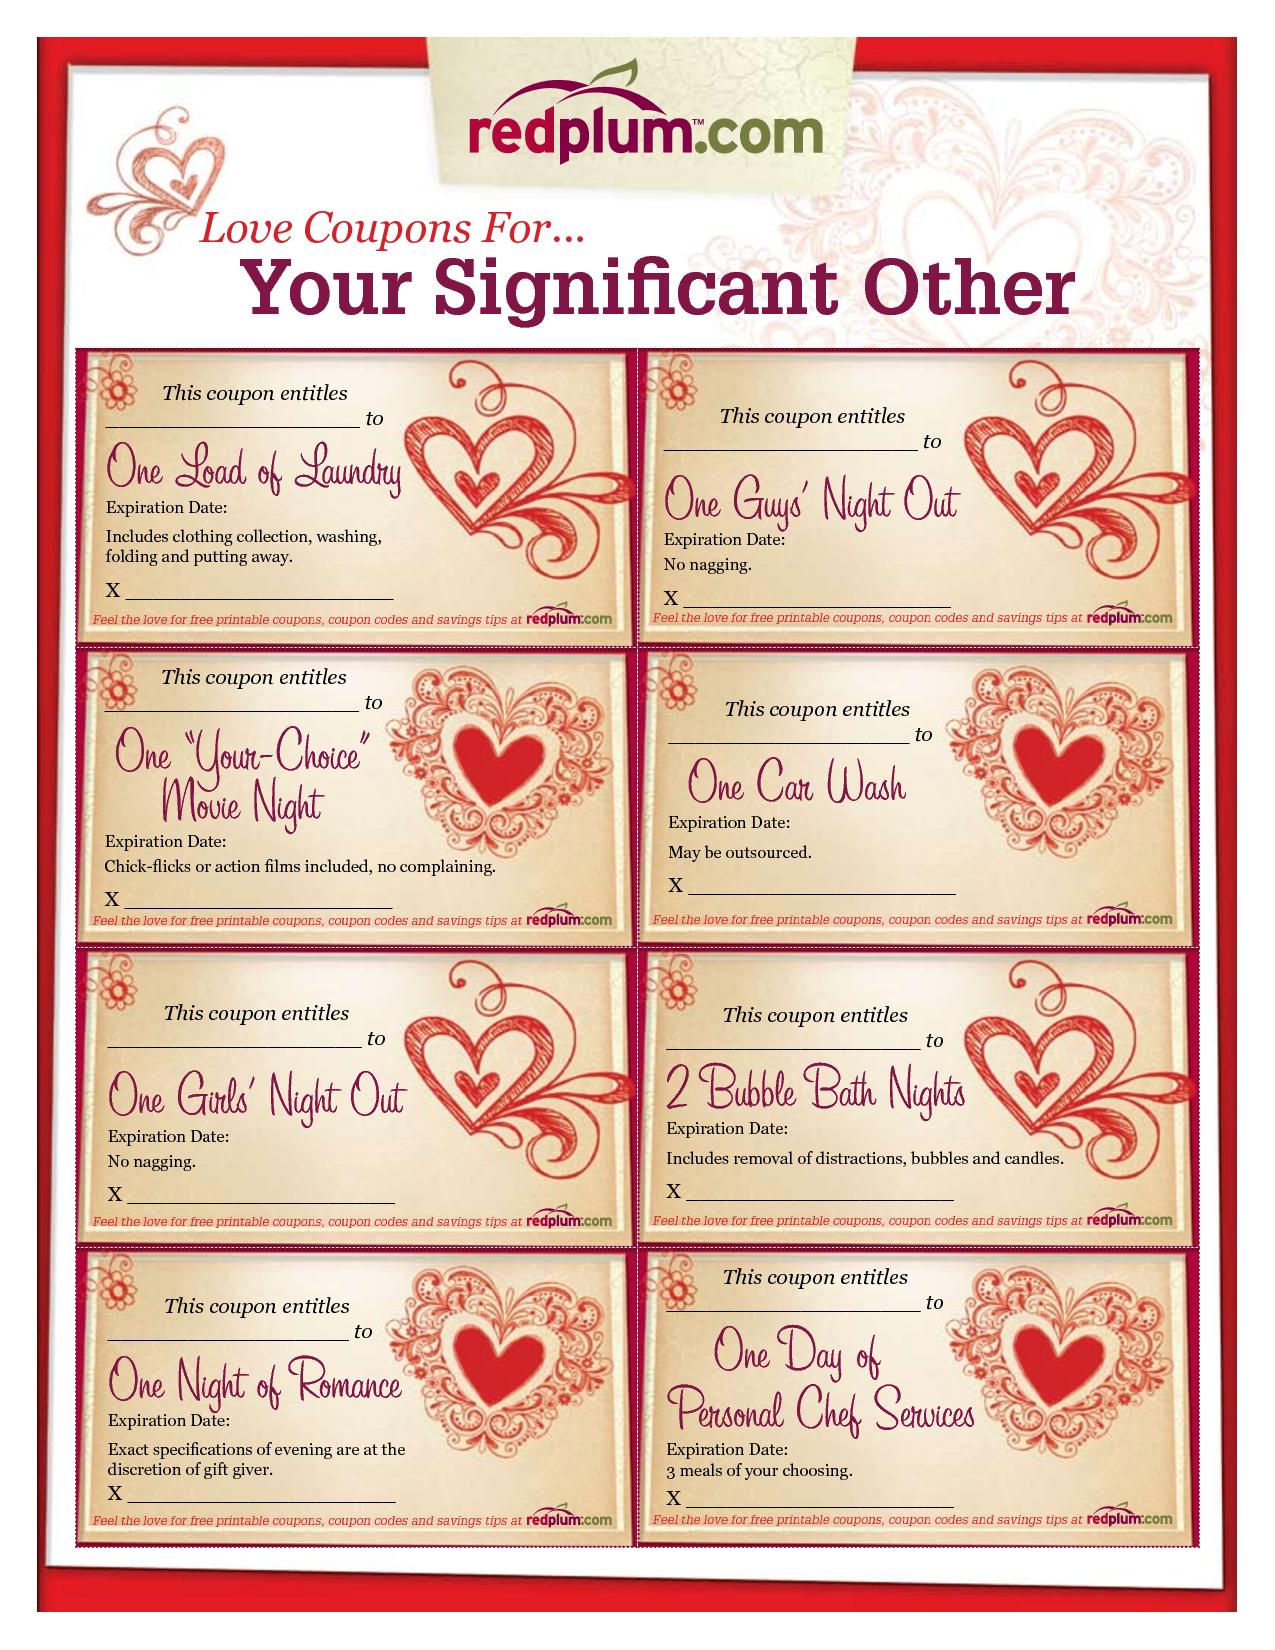 Romantic Love Coupon Template Printable | Love Coupons For Your - Free Printable Love Coupons For Wife